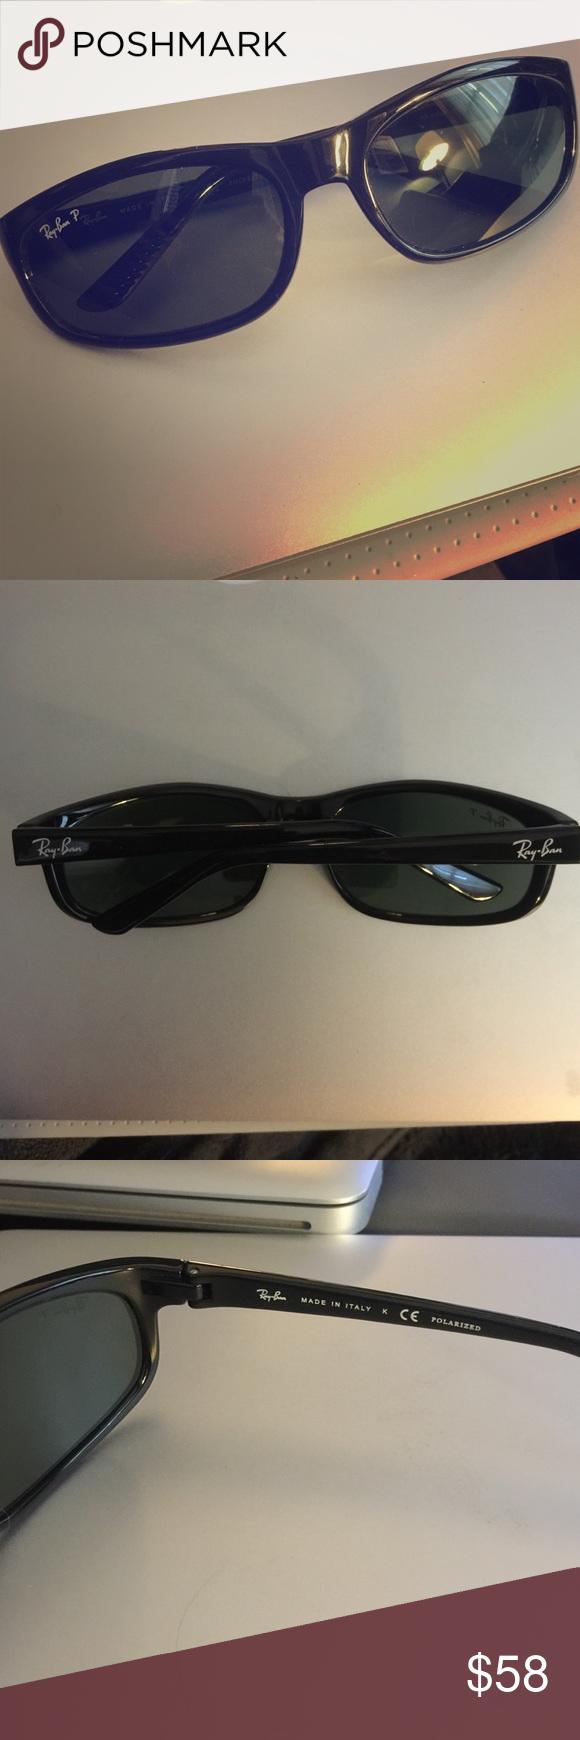 2baebe16909 ireland costco ray ban sunglasses 7446e 0968c  coupon code for cyber monday  sale euc ray ban polarized sunglass eec99 bf22c